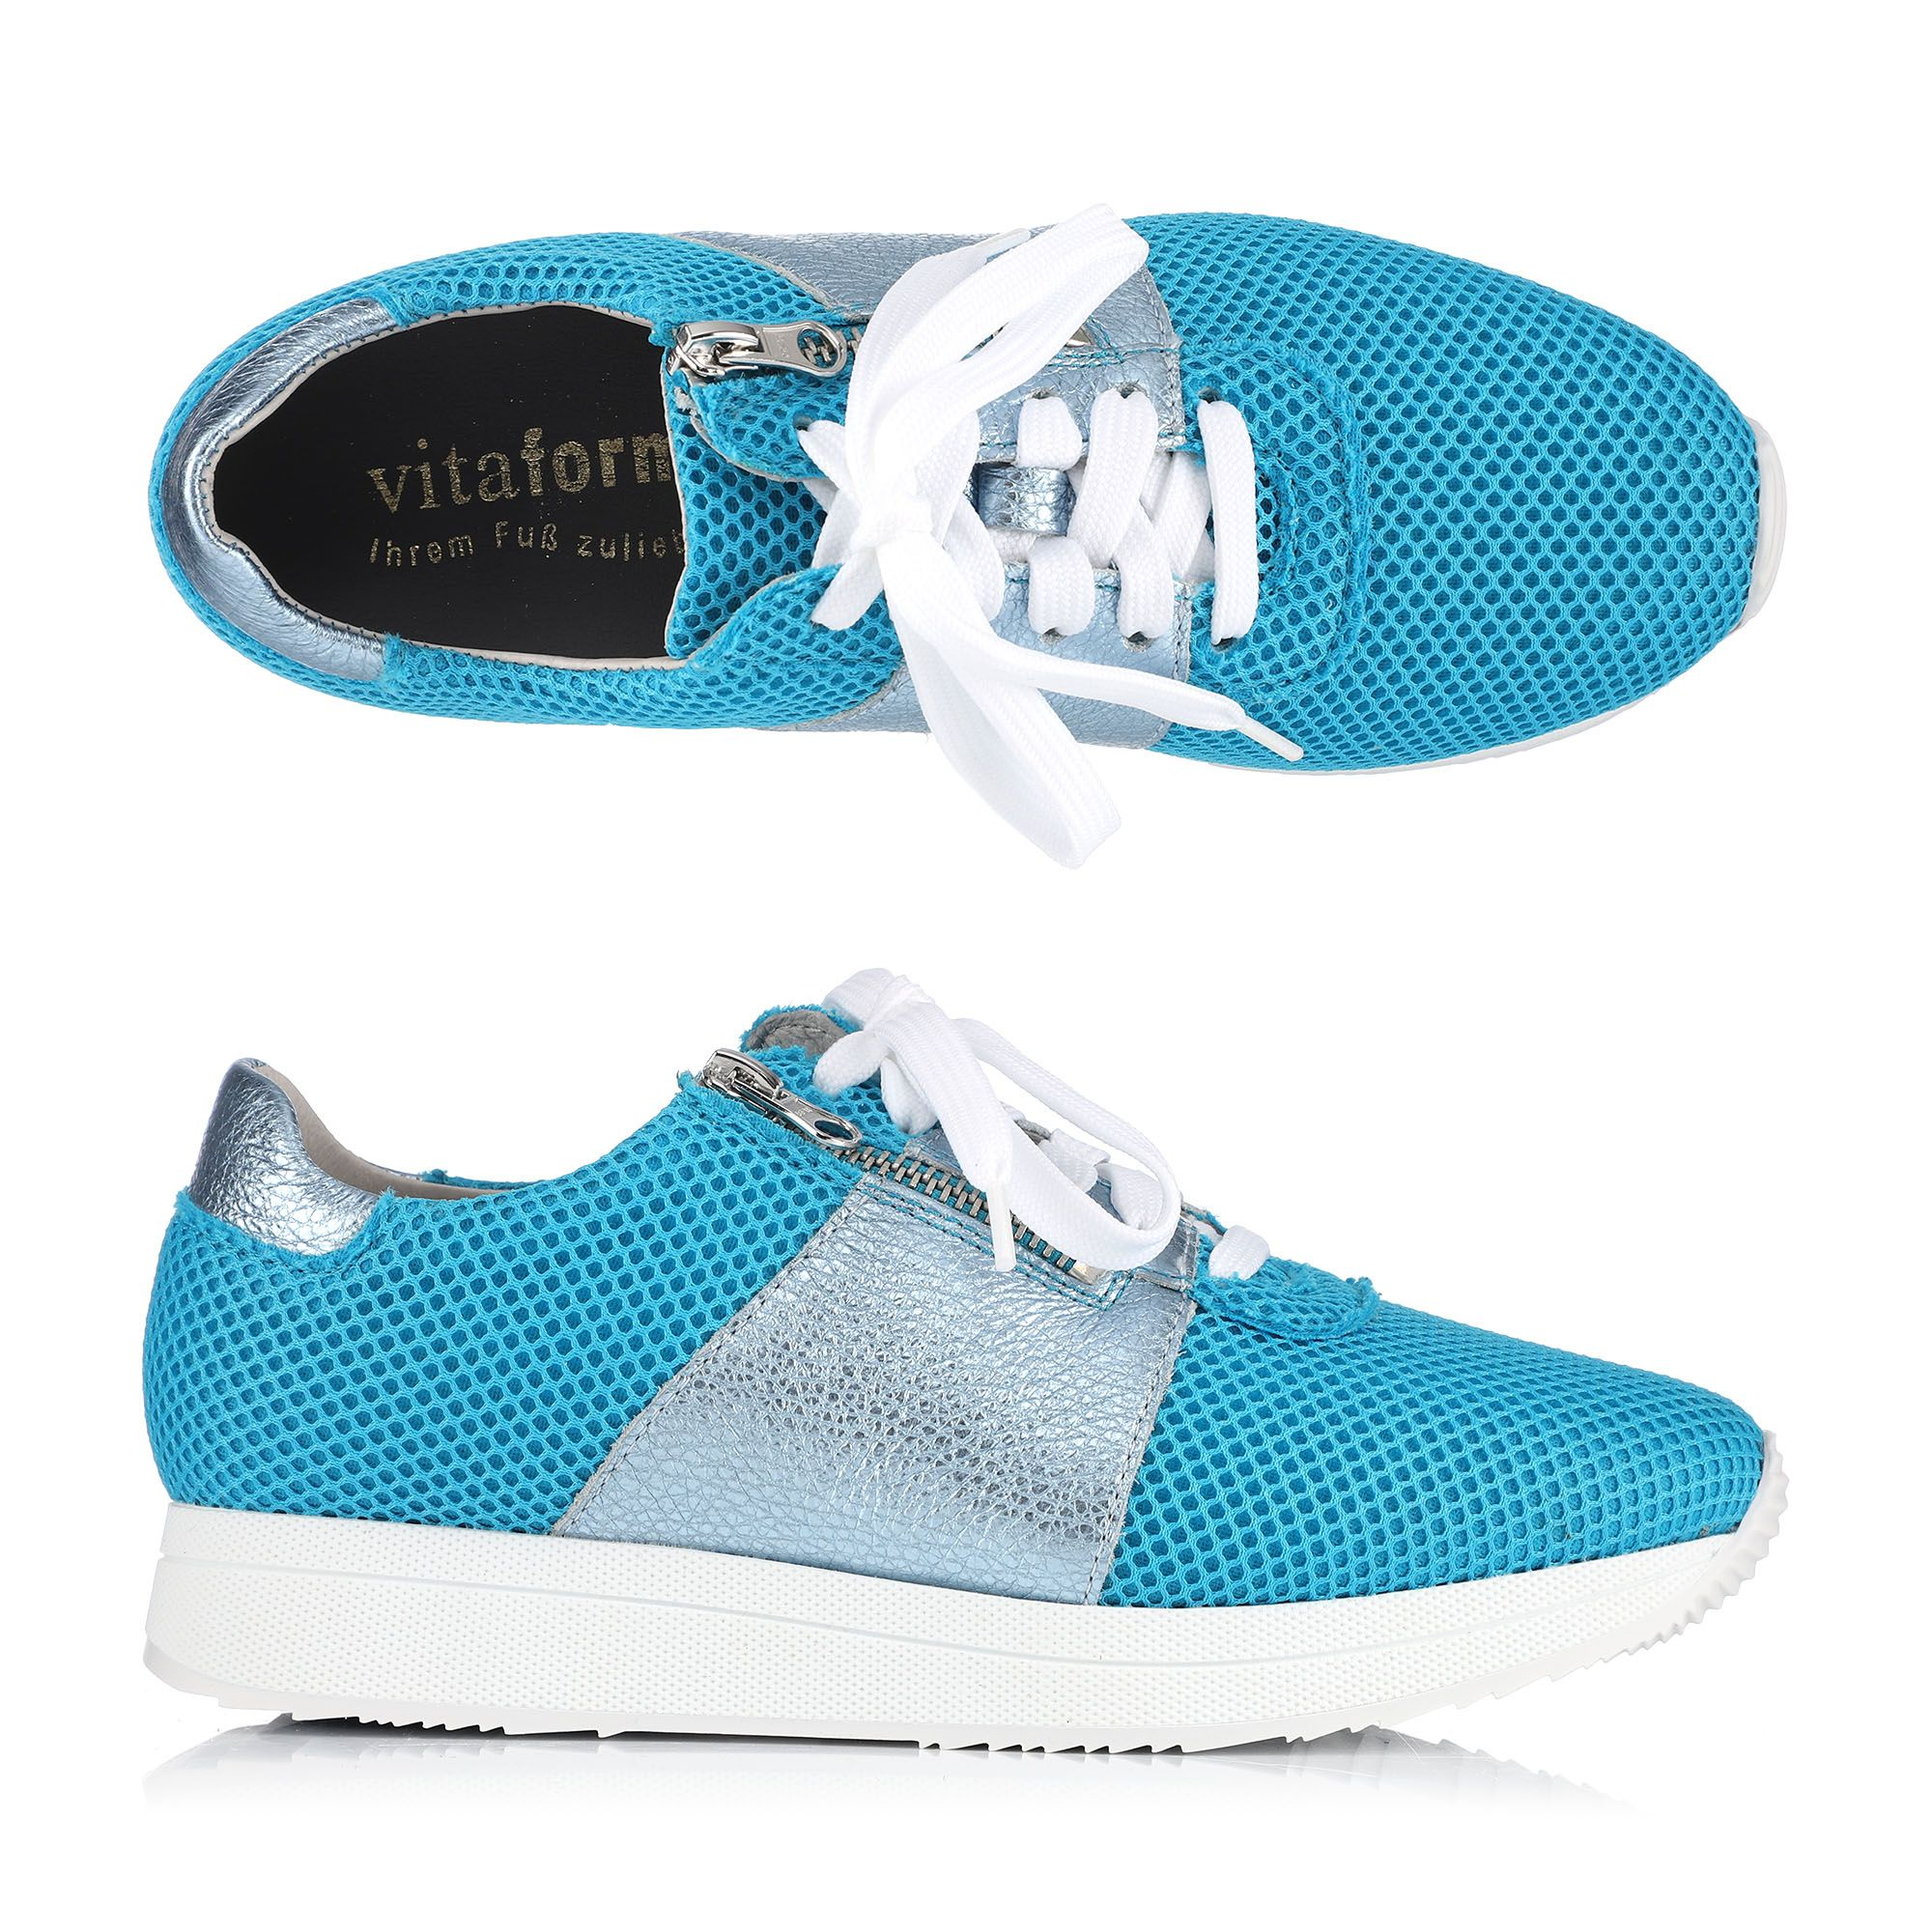 Damenschuhe VITAFORM Damen-Sneaker Softnappa Mesheinsatz Glitzer /& Neon